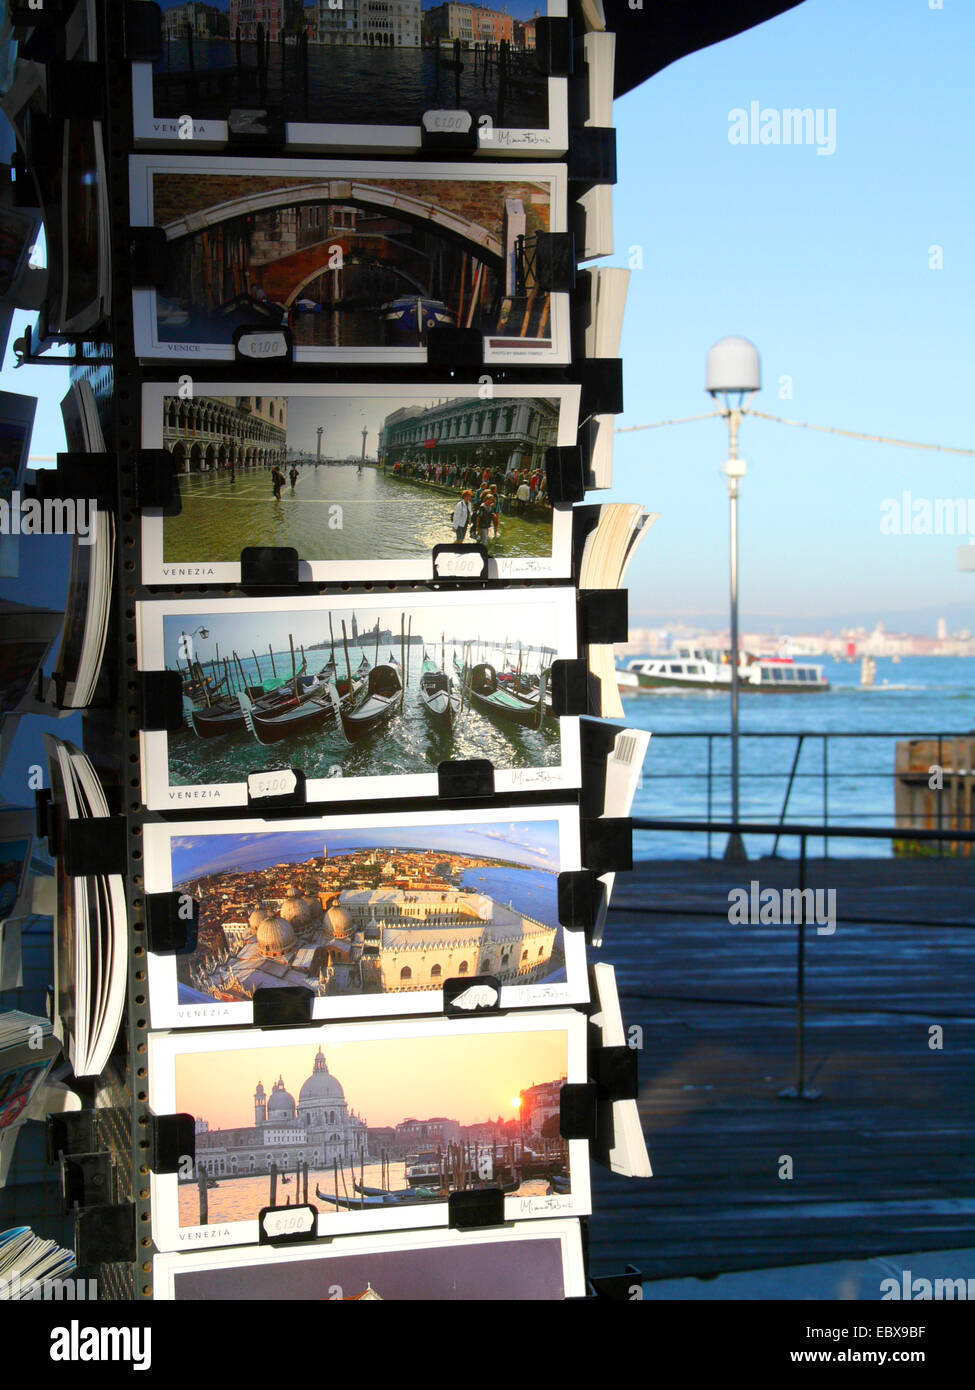 Lido di Venezia, souvenir stand con tarjetas postales, Italia, Venecia Foto de stock